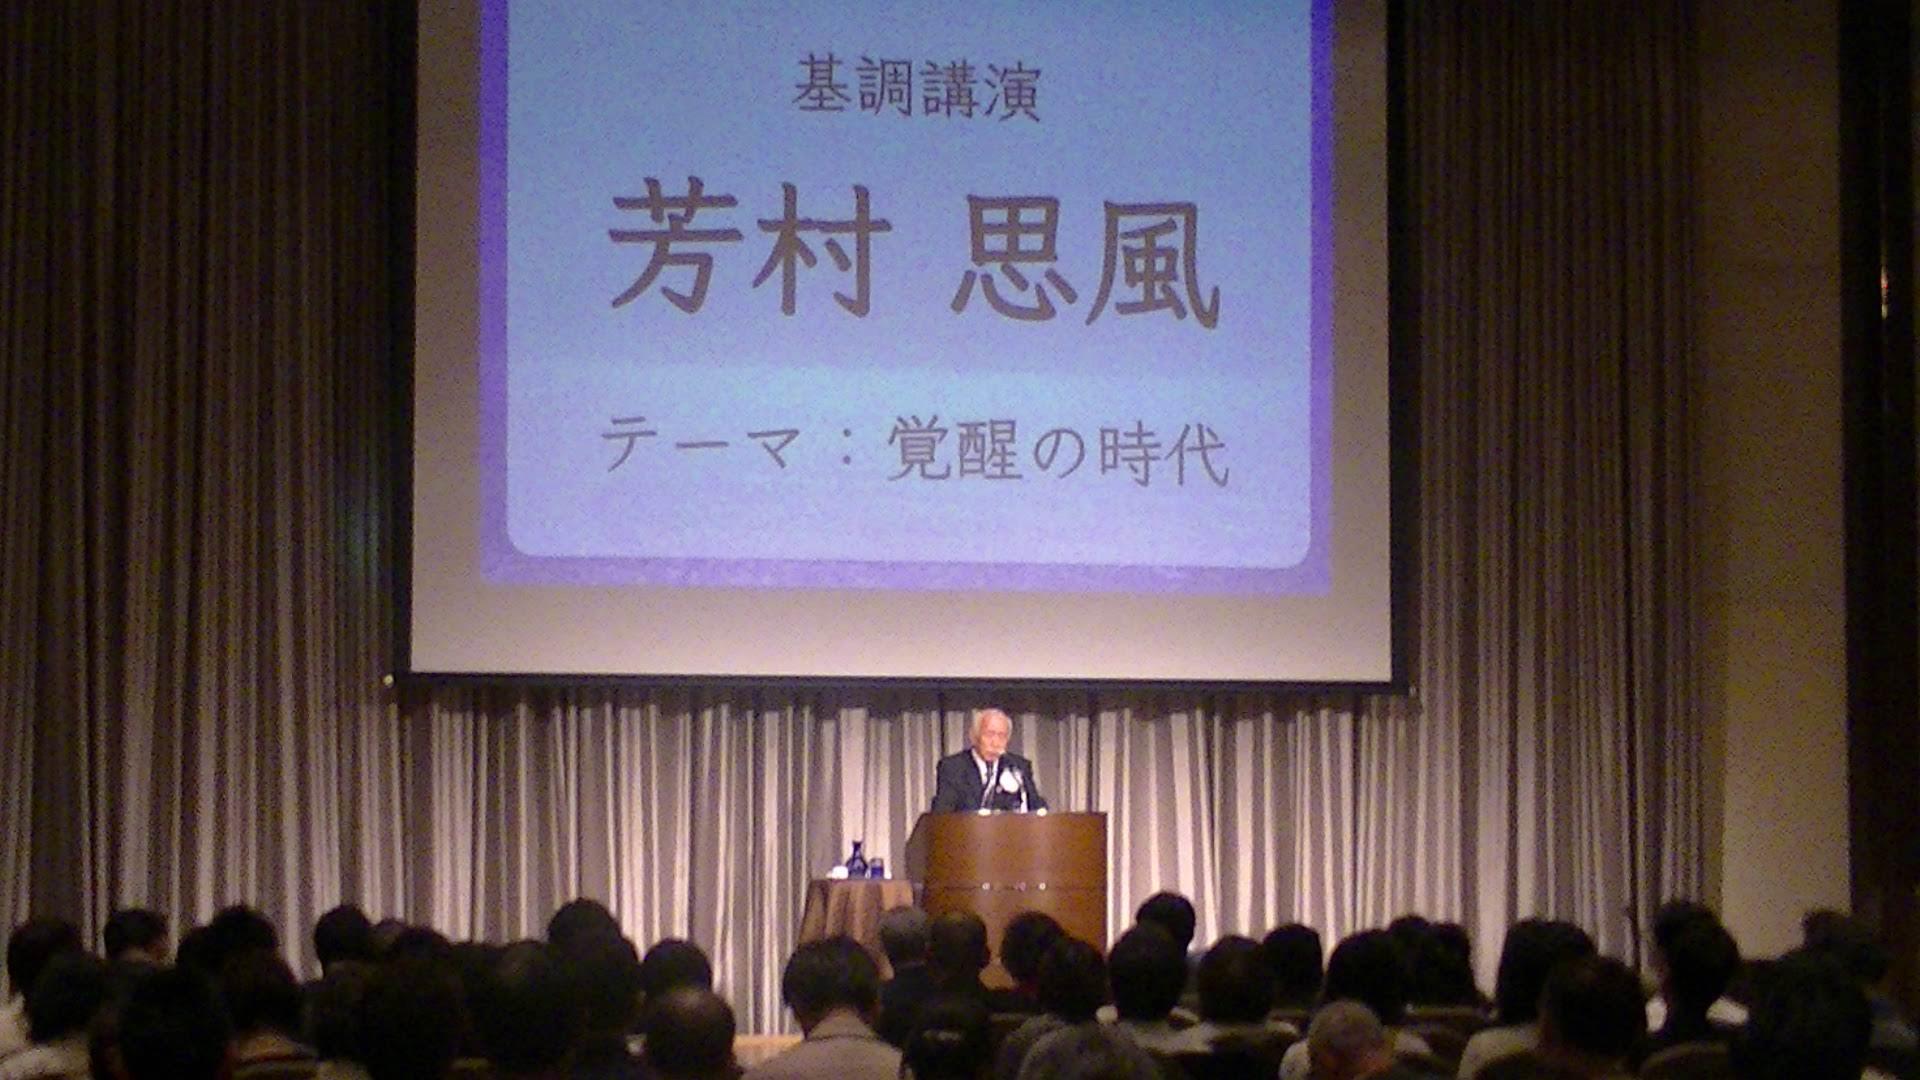 PIC 1650 1 - 思風会全国大会in広島